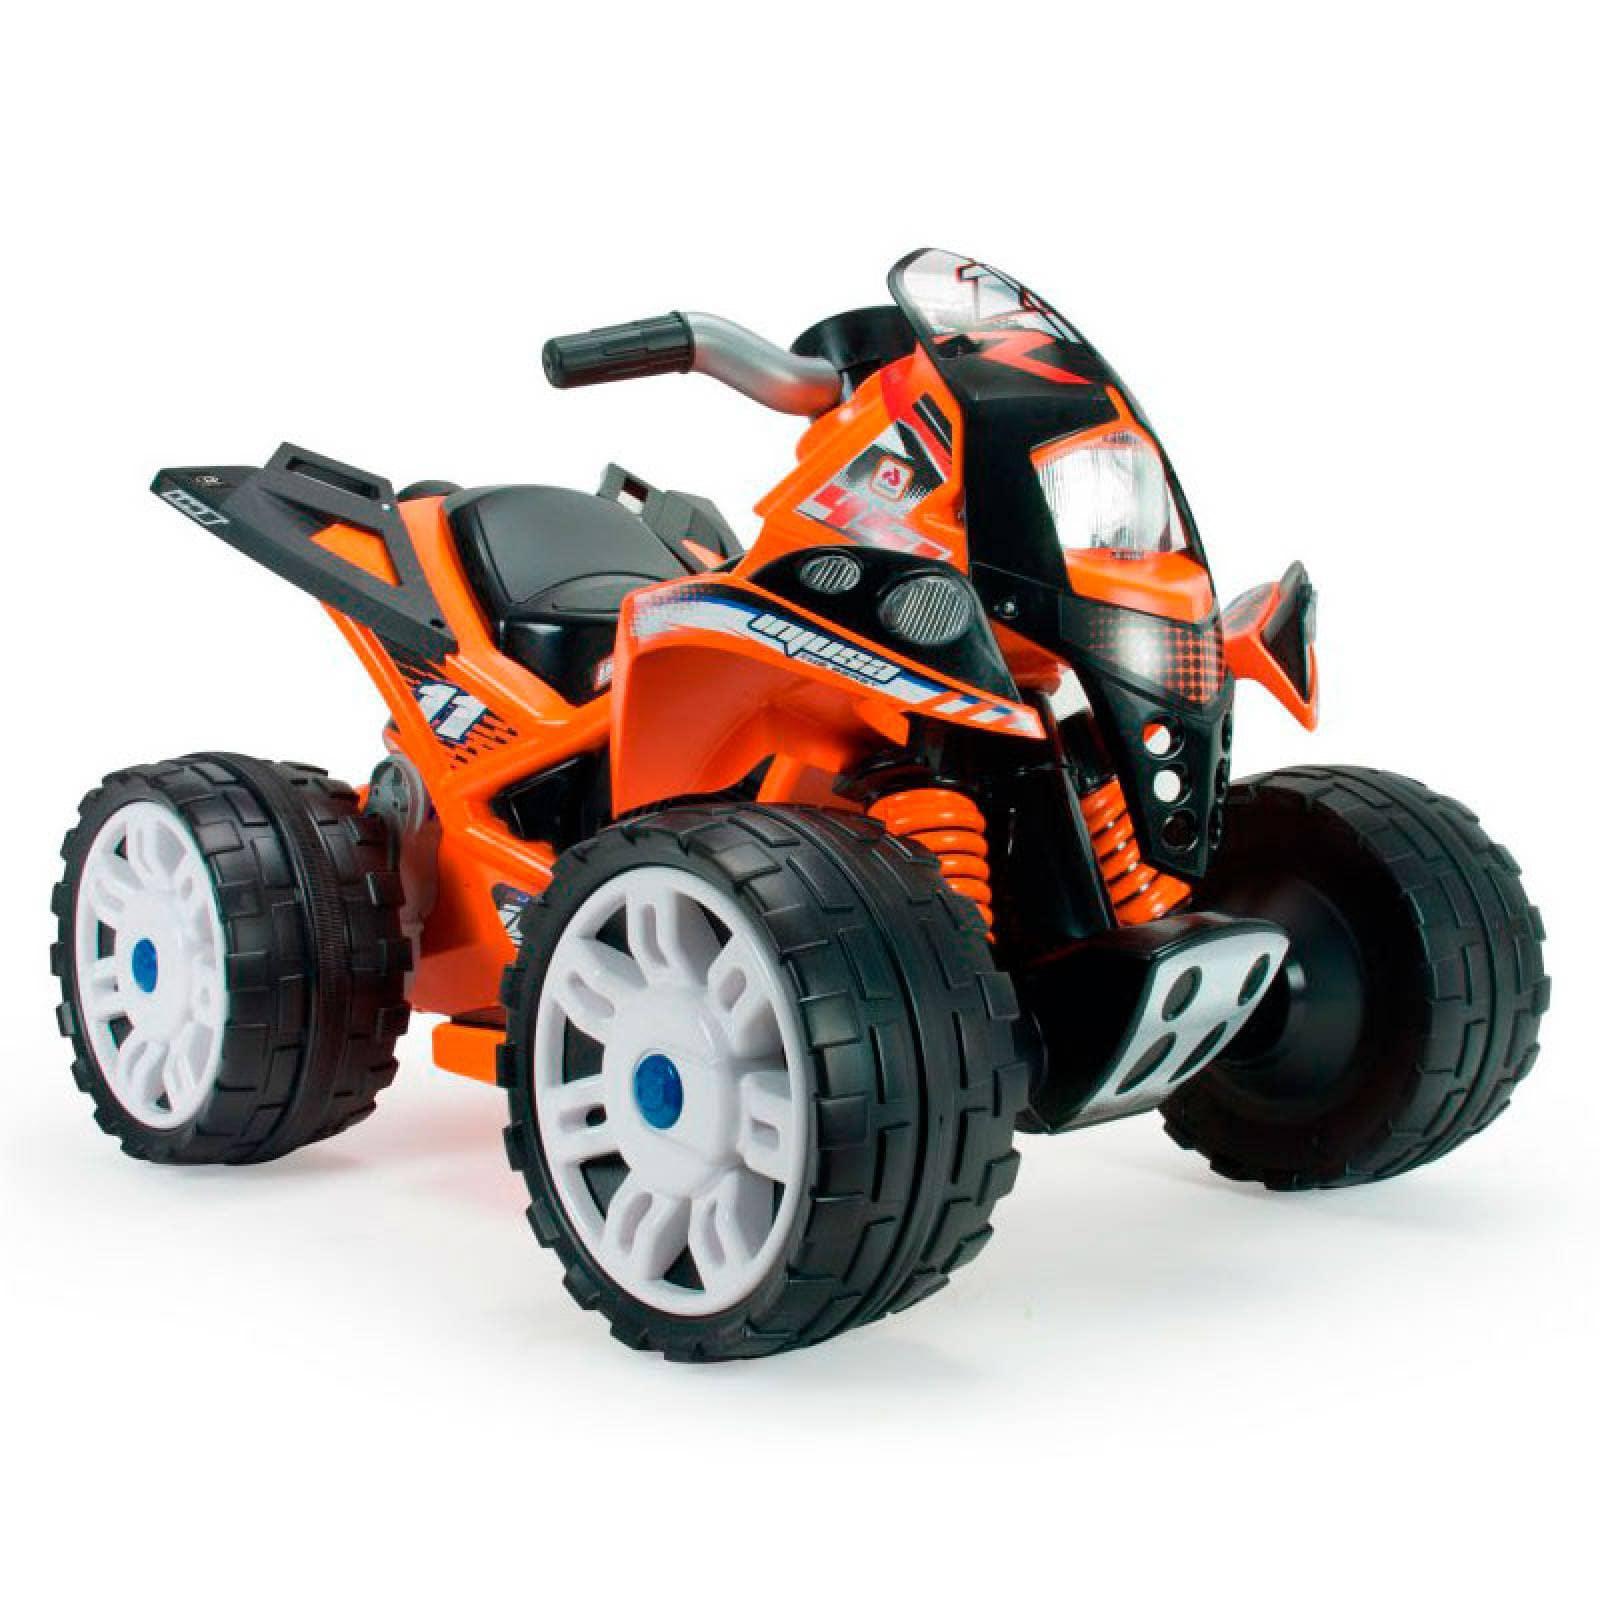 Moto Quad The Beast 6V Juguete Niños Injusa